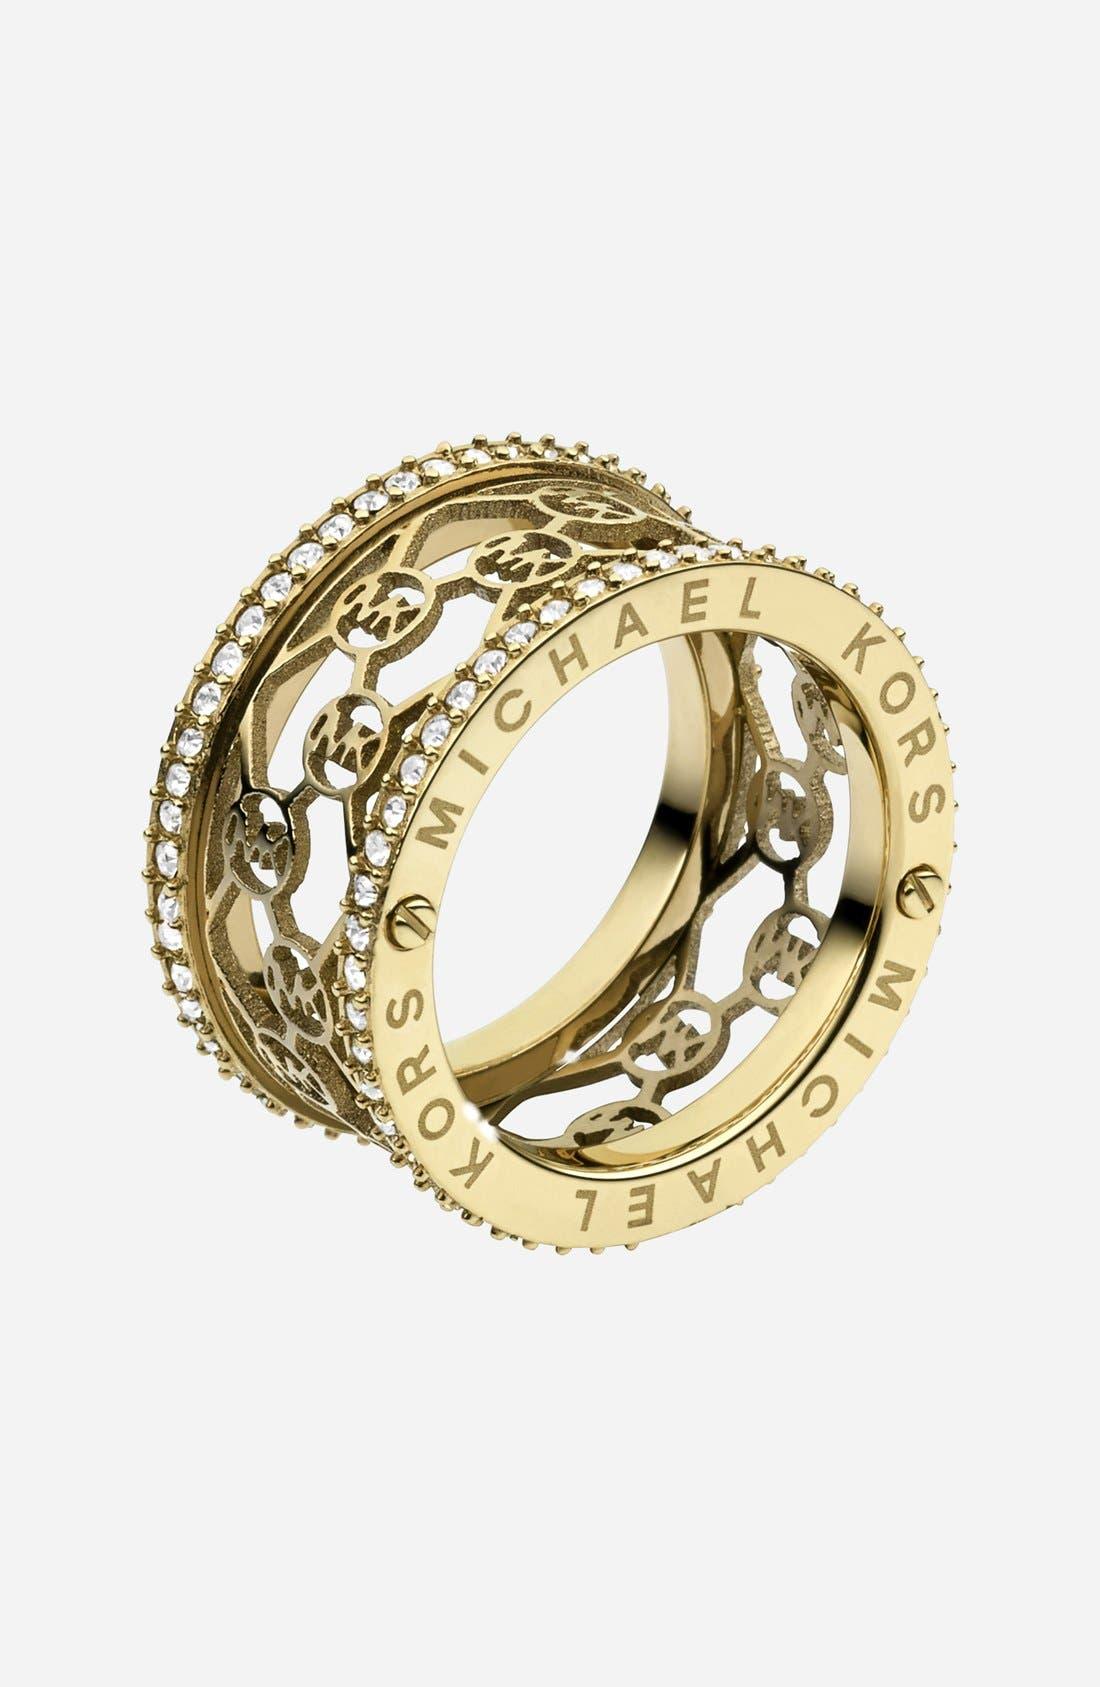 Alternate Image 1 Selected - Michael Kors 'Monogram' Logo Cigar Band Ring